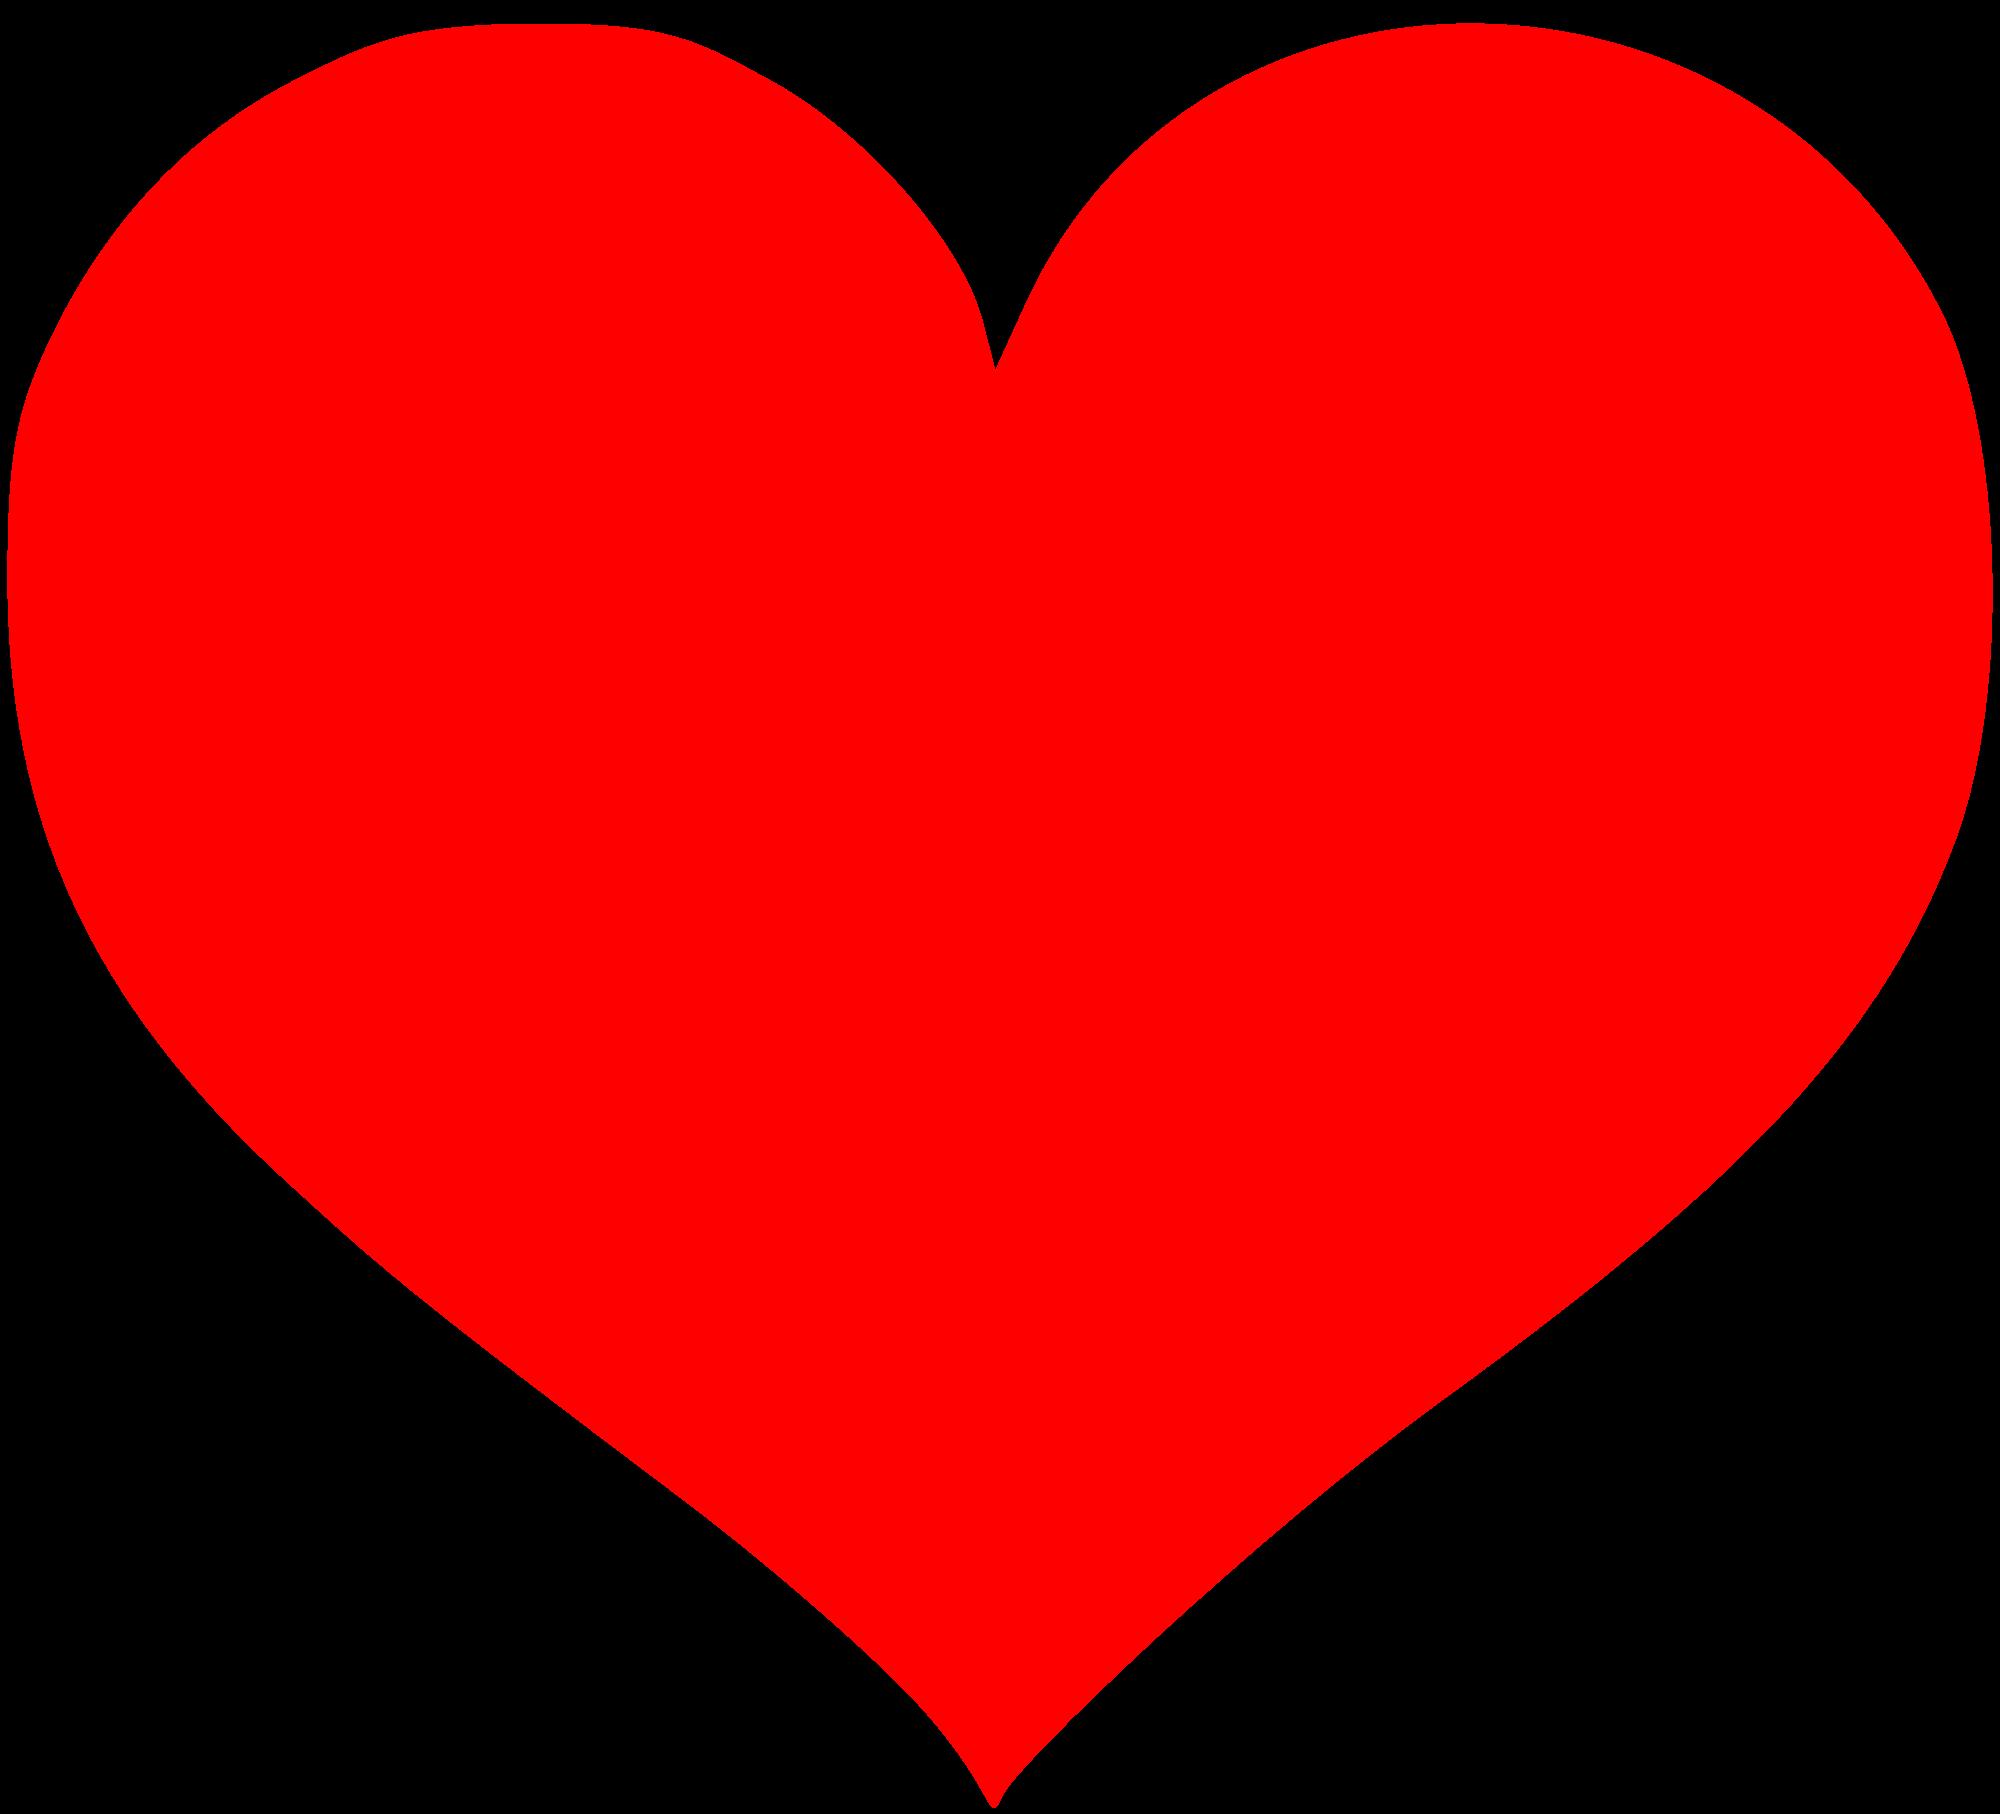 File heart svg wikimedia. Love hearts png